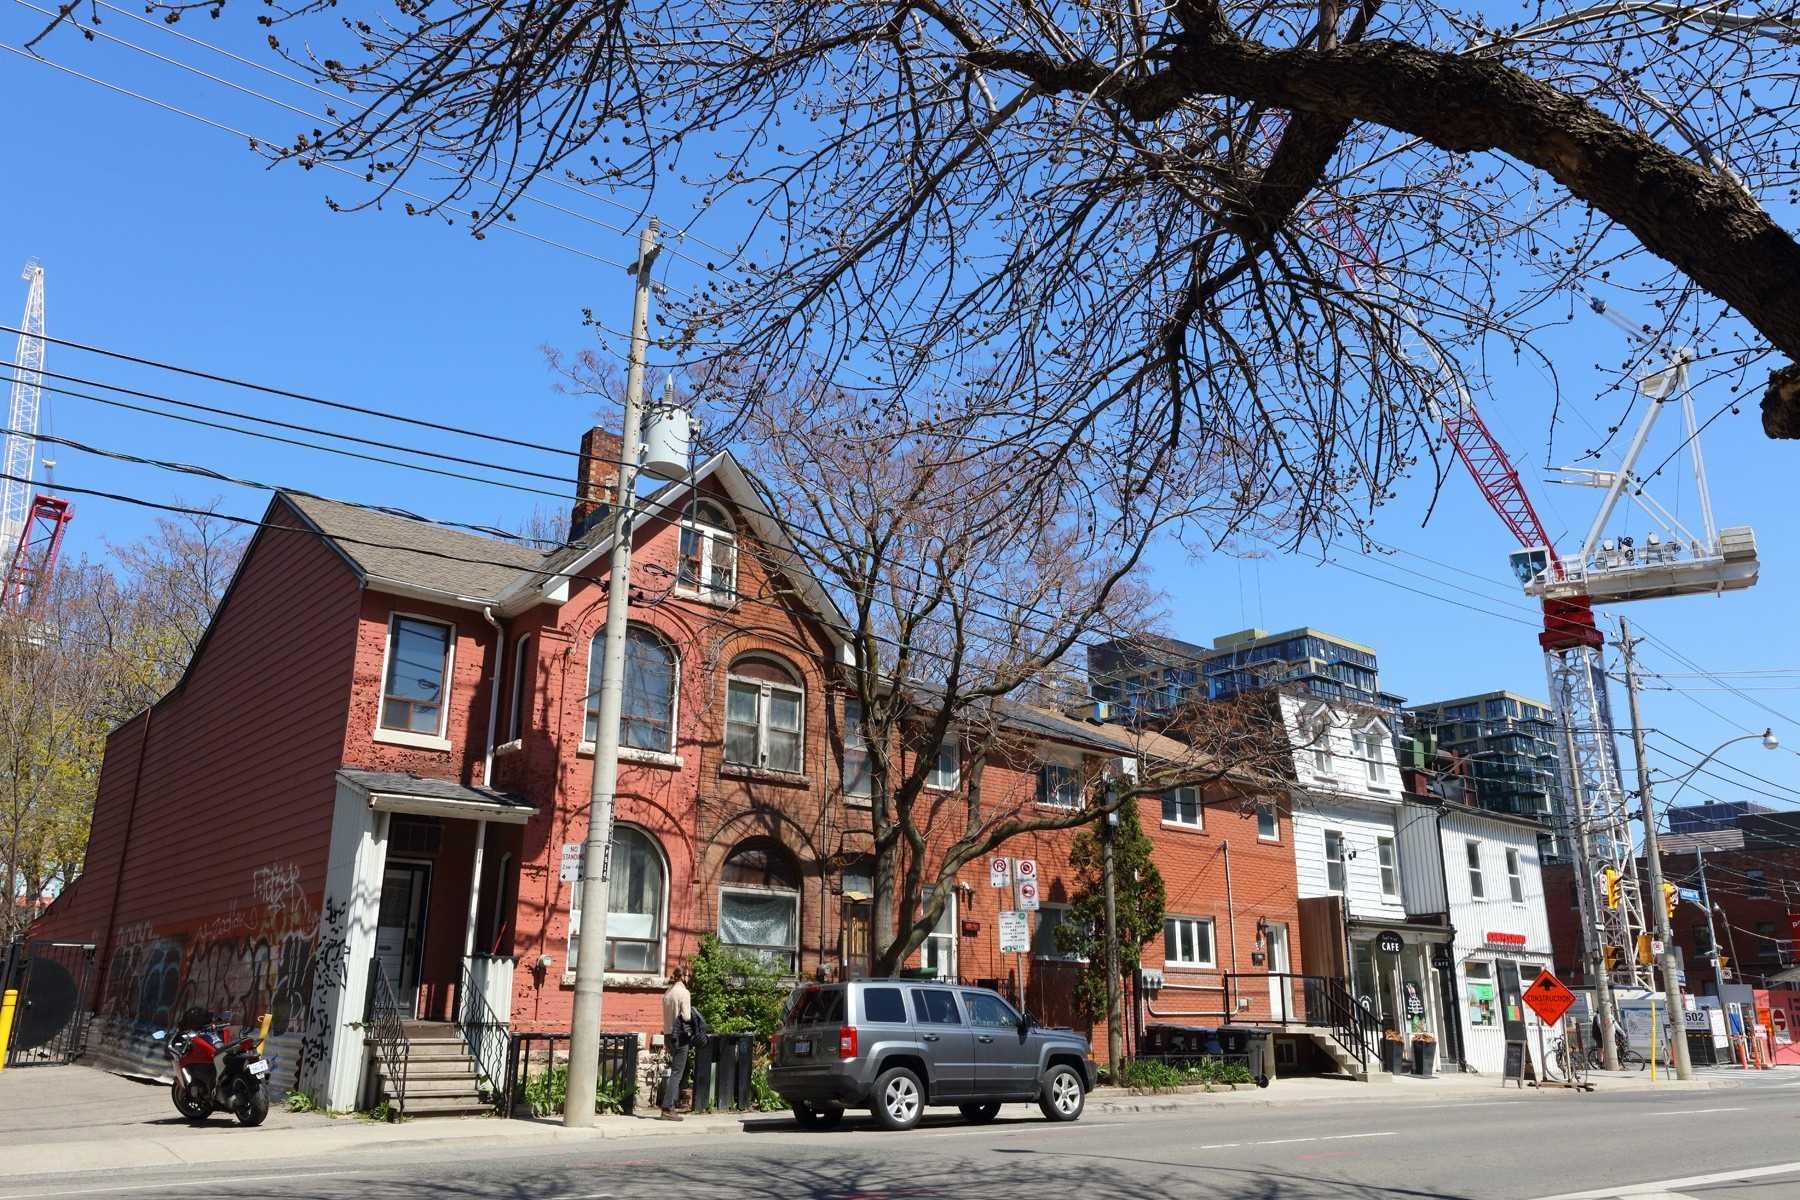 514 Adelaide St, Toronto, Ontario M5V-1T5, 3 Bedrooms Bedrooms, 8 Rooms Rooms,2 BathroomsBathrooms,Semi-detached,For Sale,Adelaide,C5208709